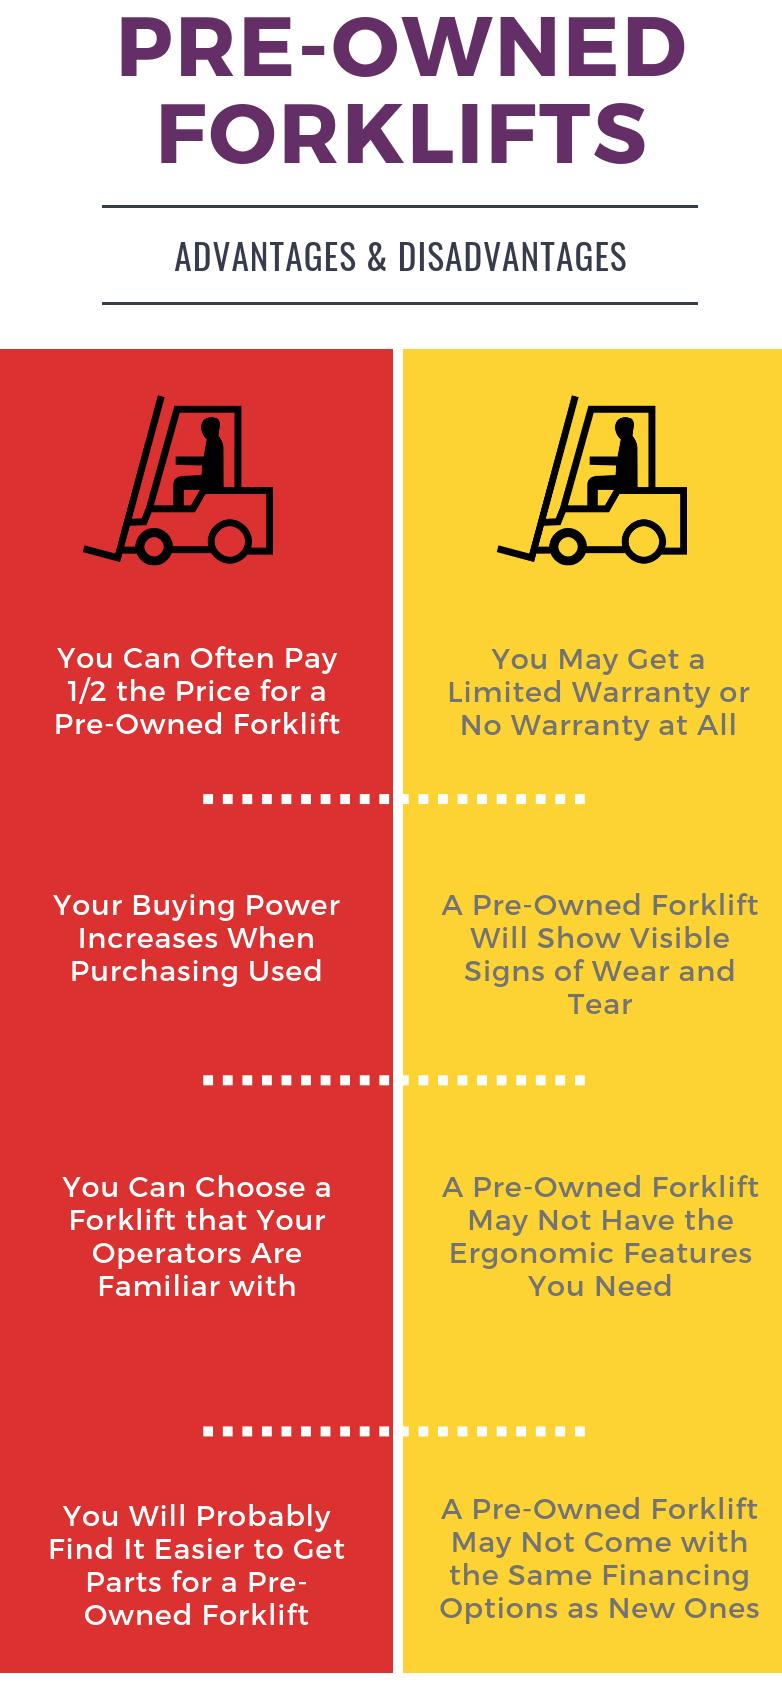 pre-owned-forklift-advantages-disadvantages-chart.png